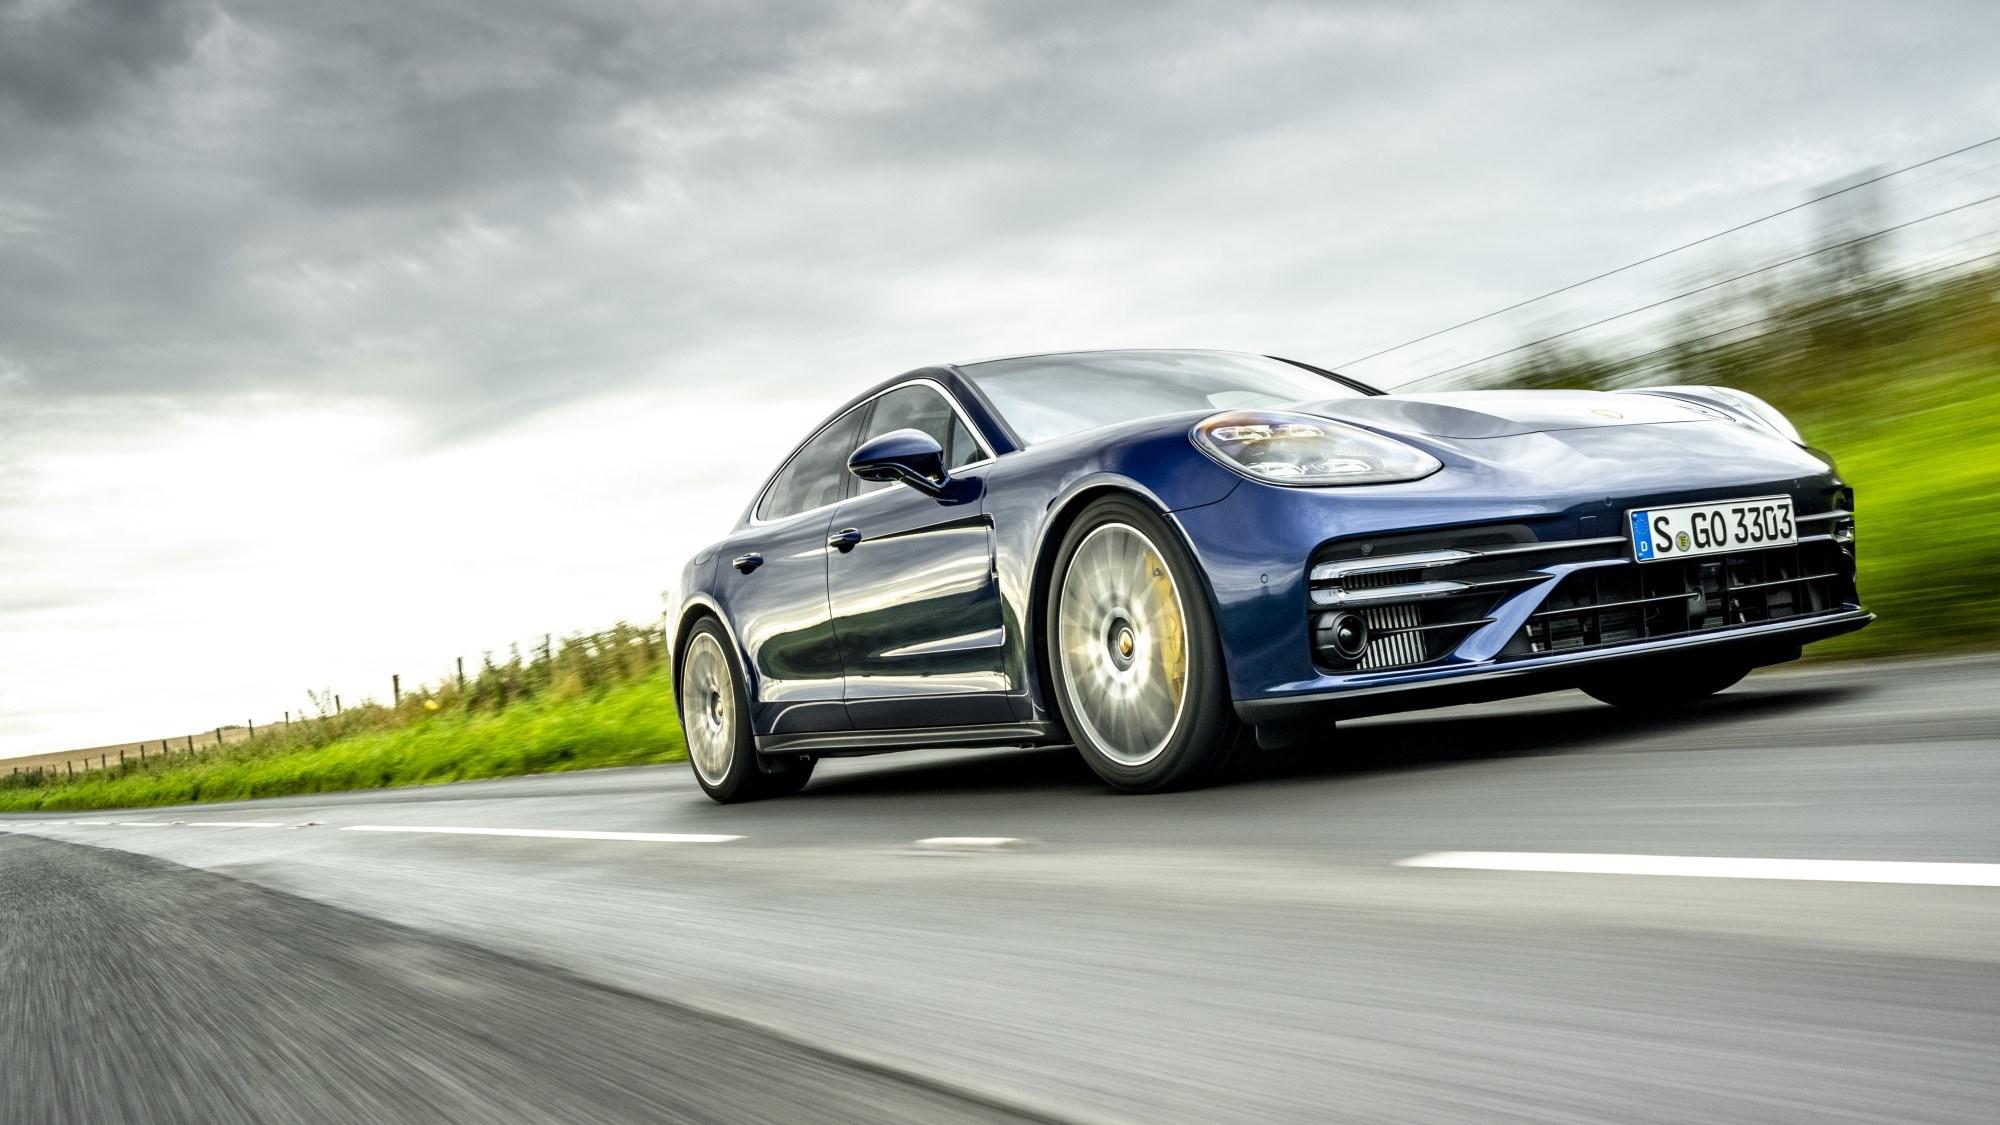 2020 Porsche Panamera Turbo S - front tracking